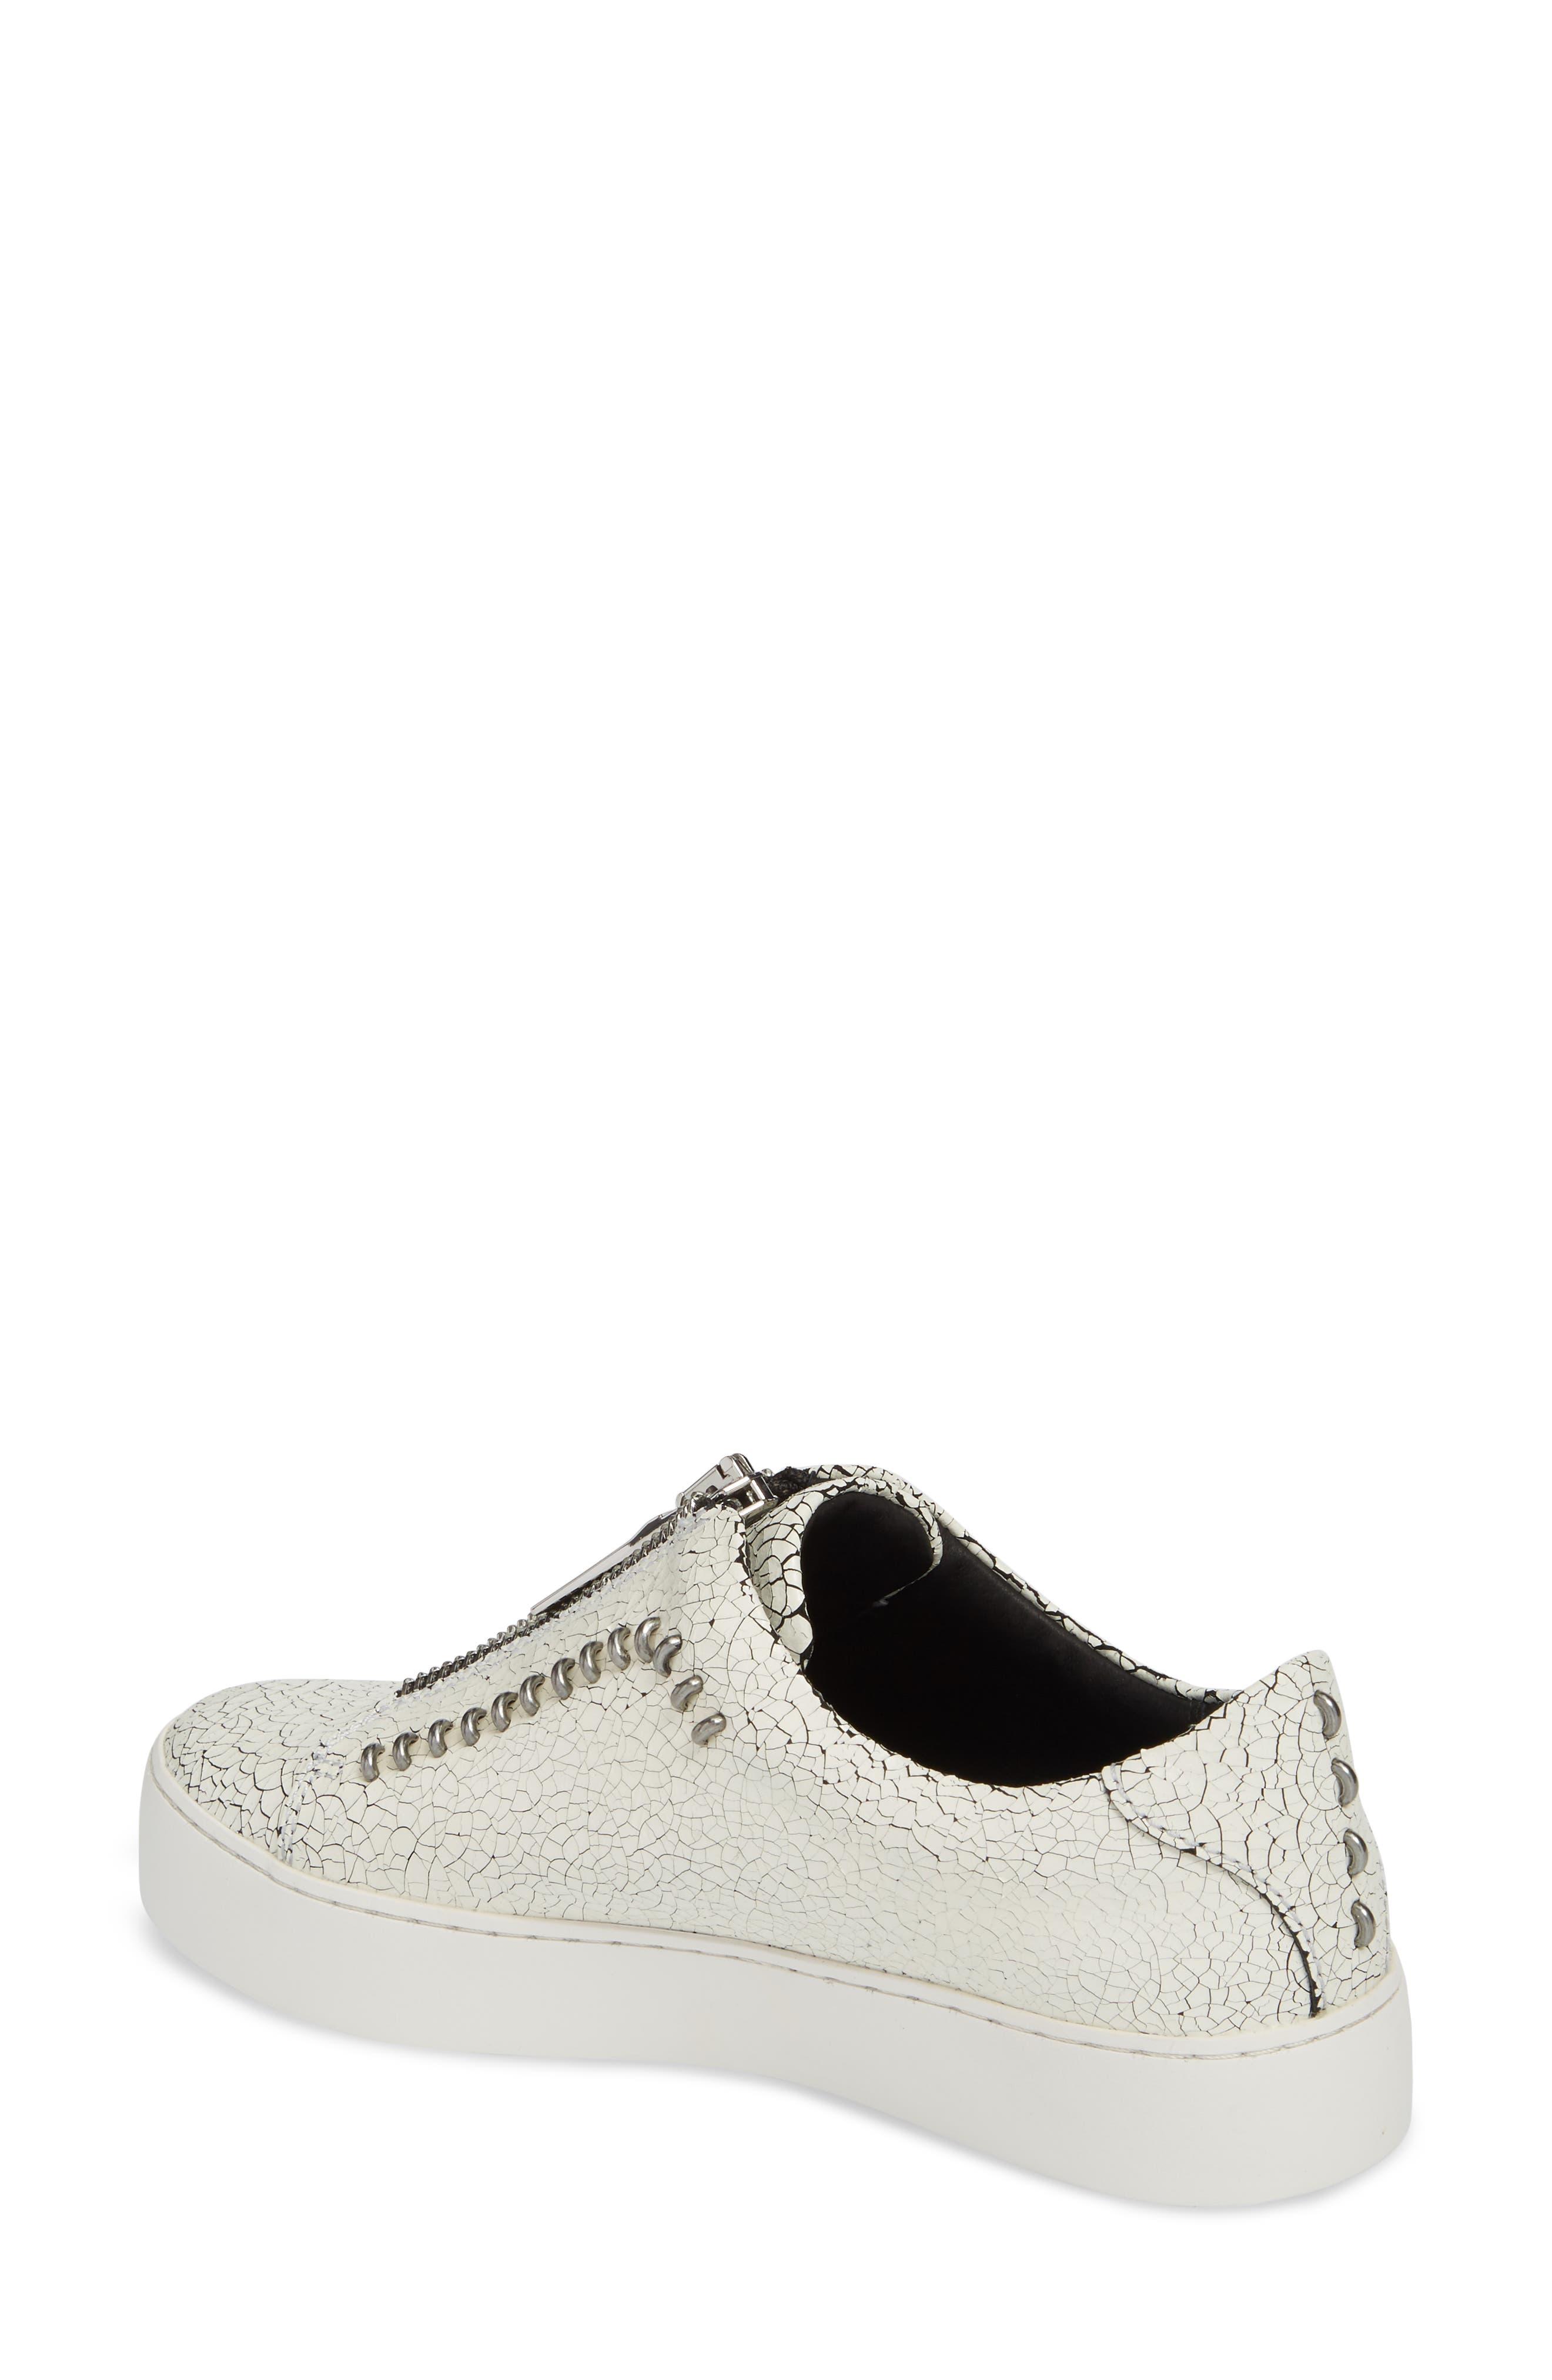 Lena Rebel Zip Sneaker,                             Alternate thumbnail 2, color,                             White Leather